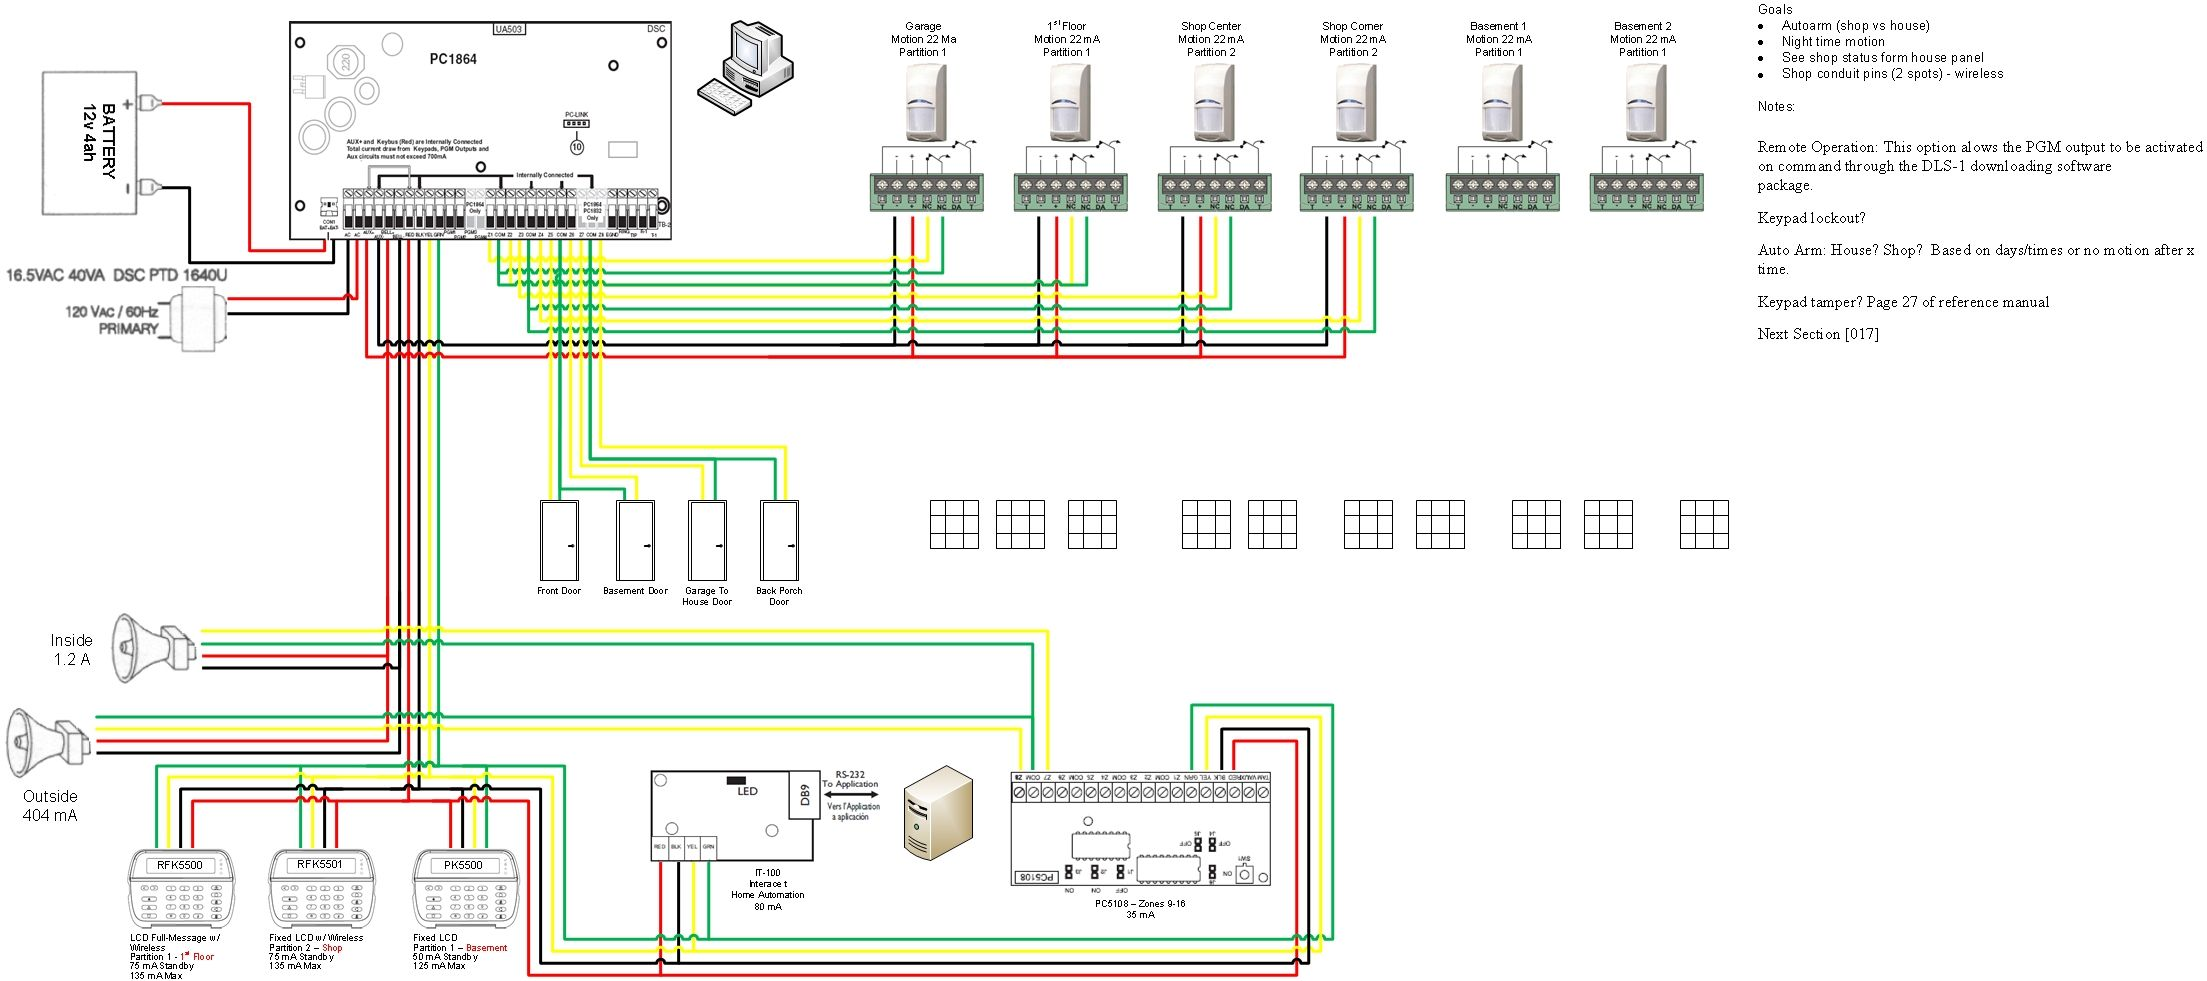 dsc alarm box wiring diagram wiring diagrams bib dsc neo wiring diagram dsc wiring diagram [ 2207 x 981 Pixel ]